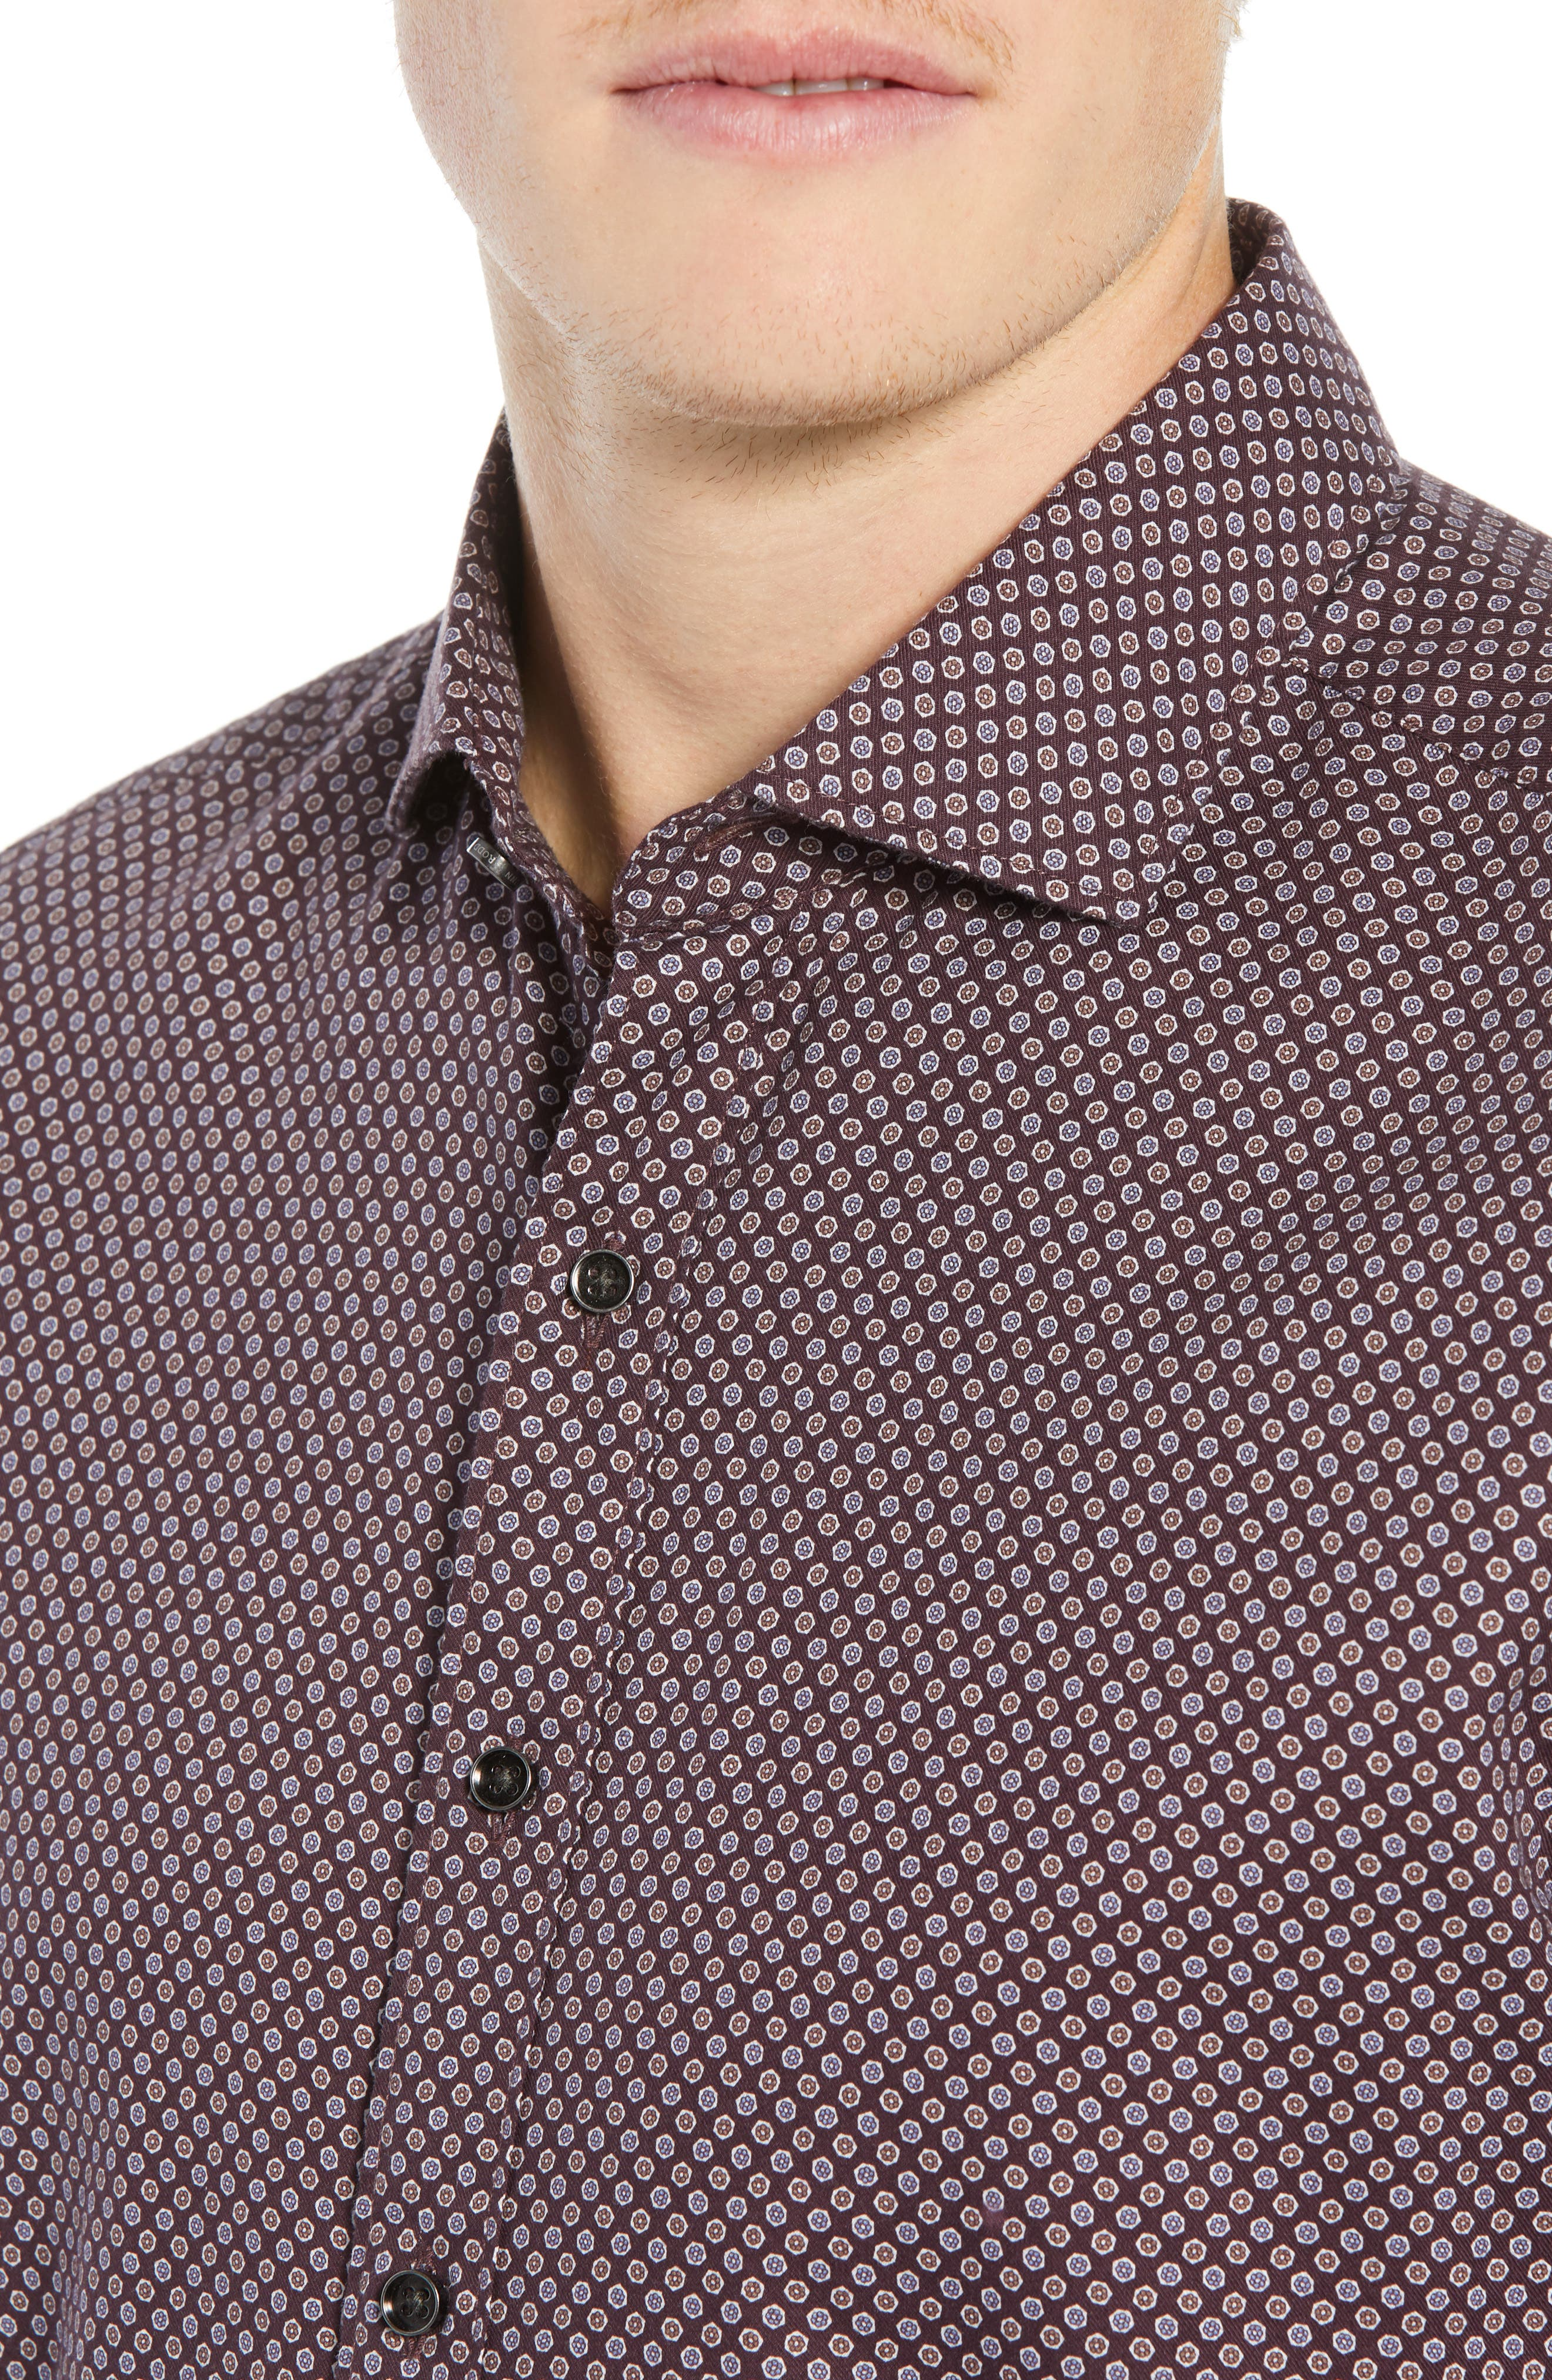 Marsden Bay Regular Fit Sport Shirt,                             Alternate thumbnail 2, color,                             BORDEAUX